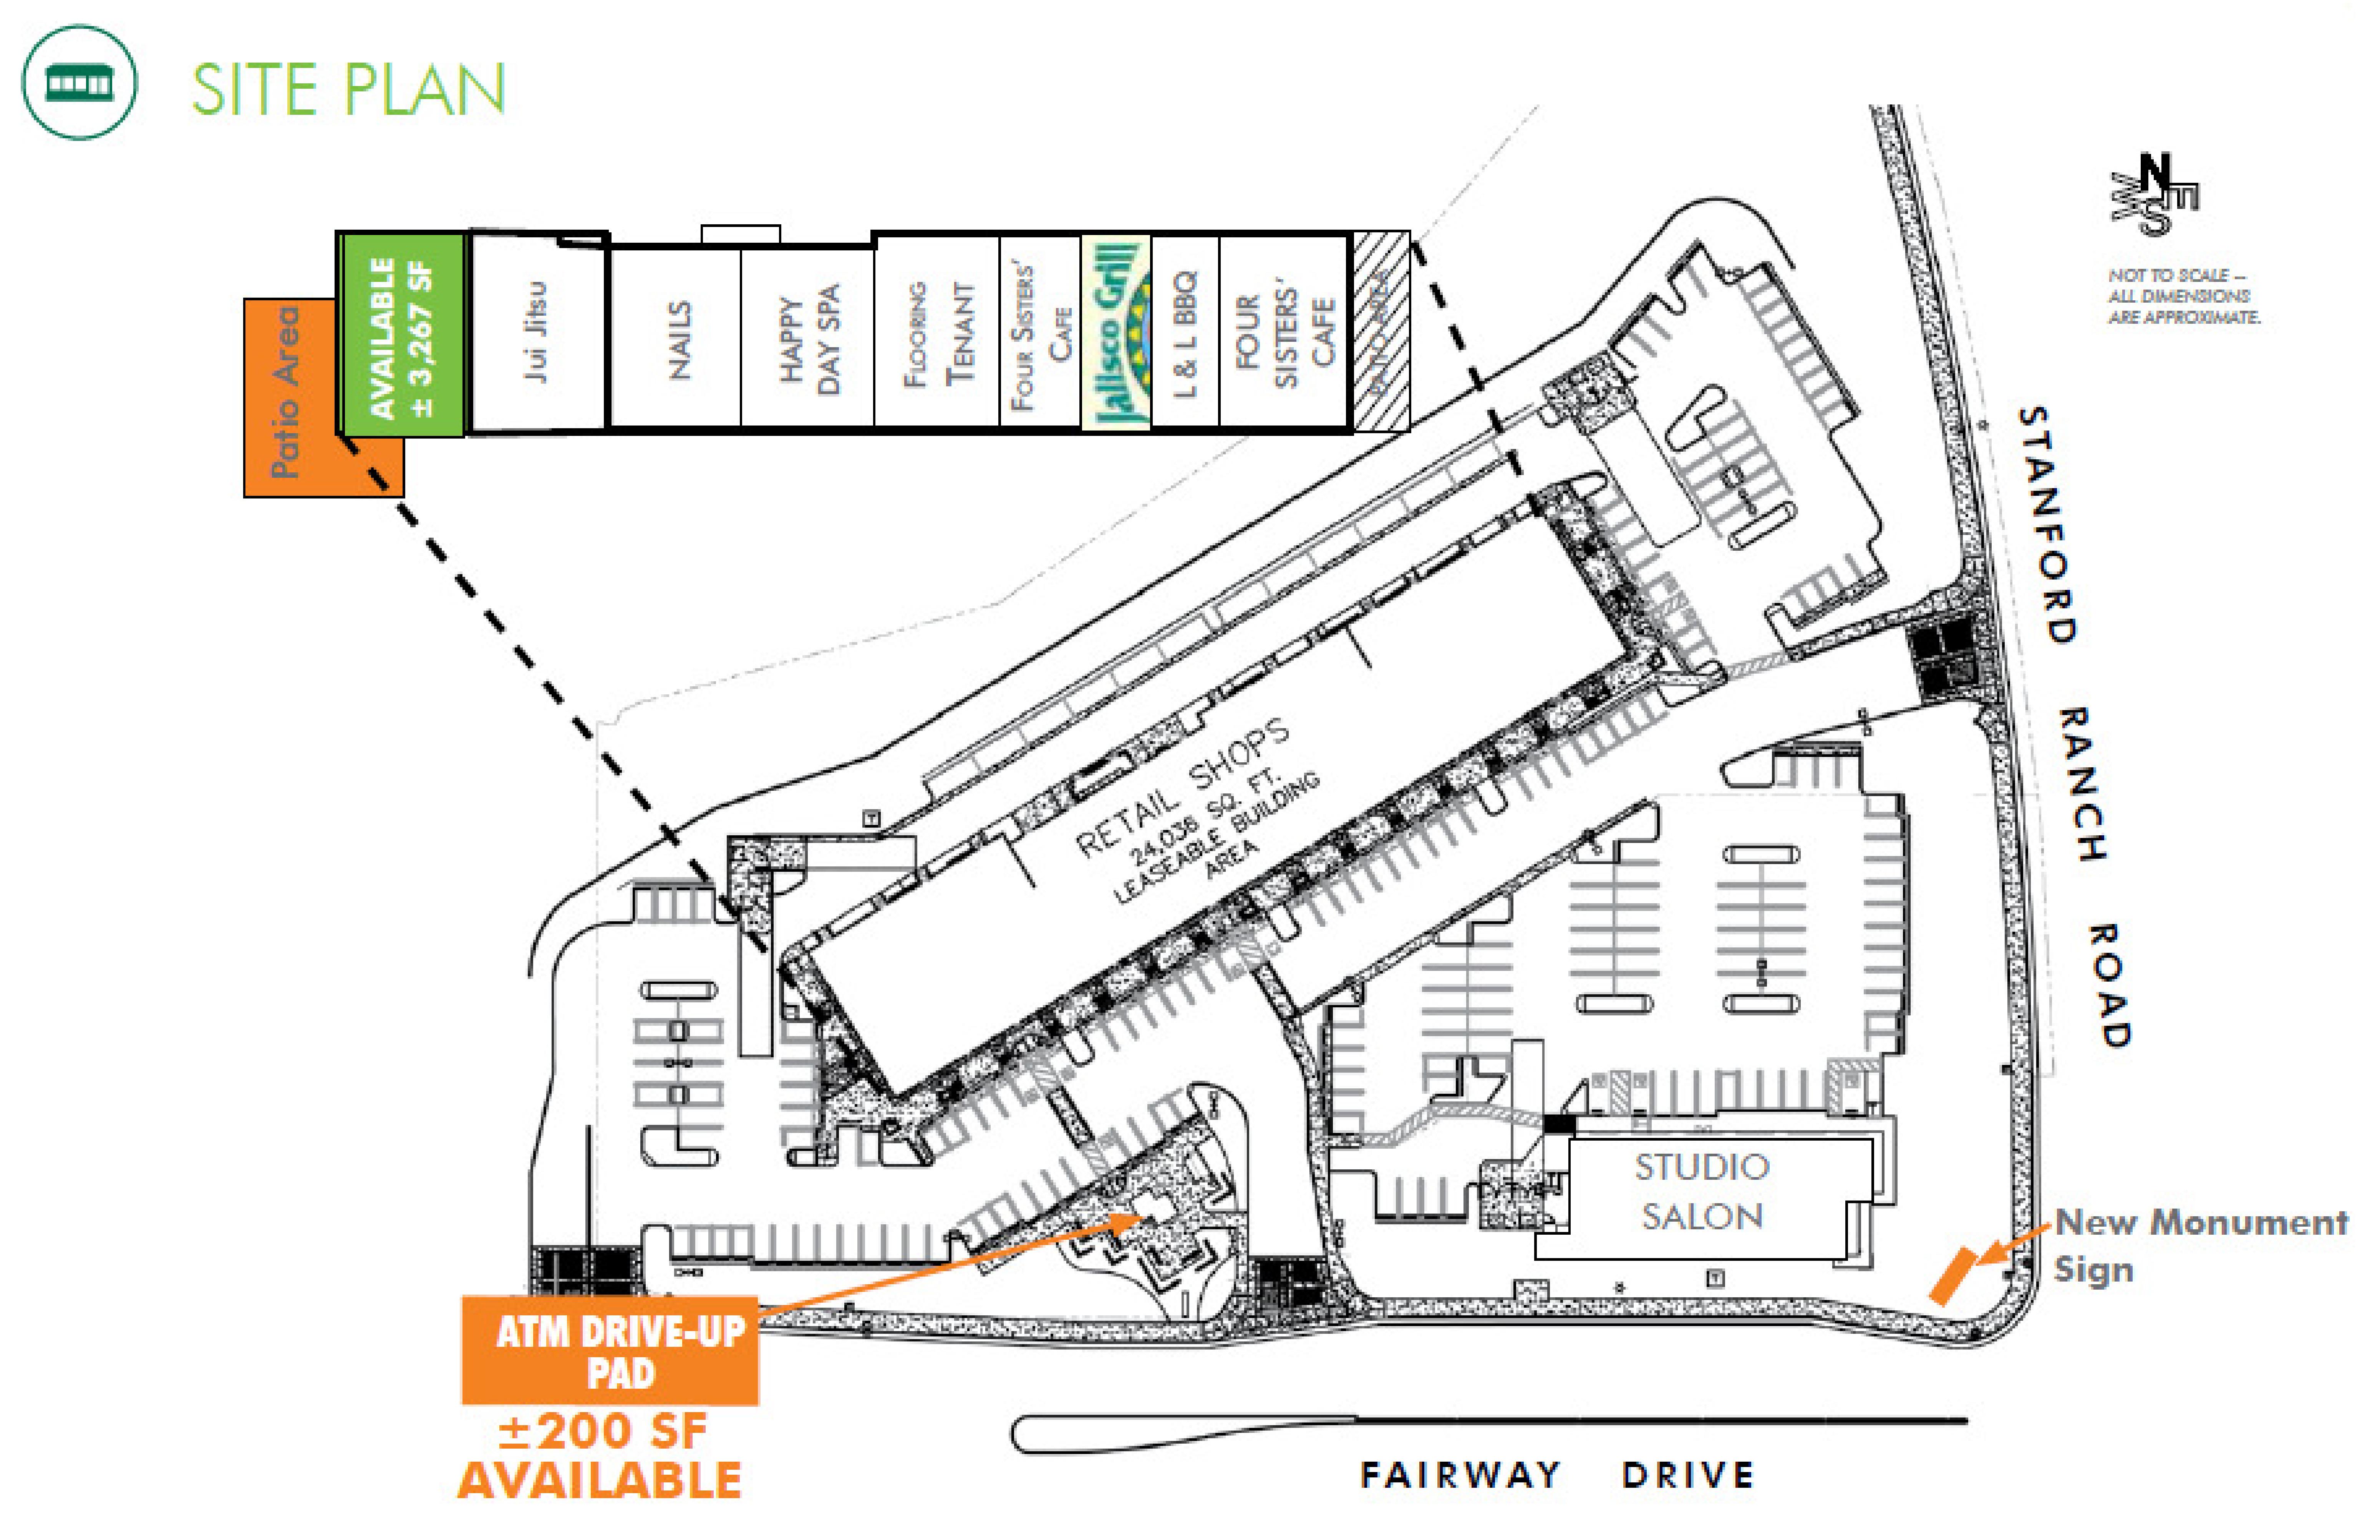 Fairway Plaza - Roseville: site plan